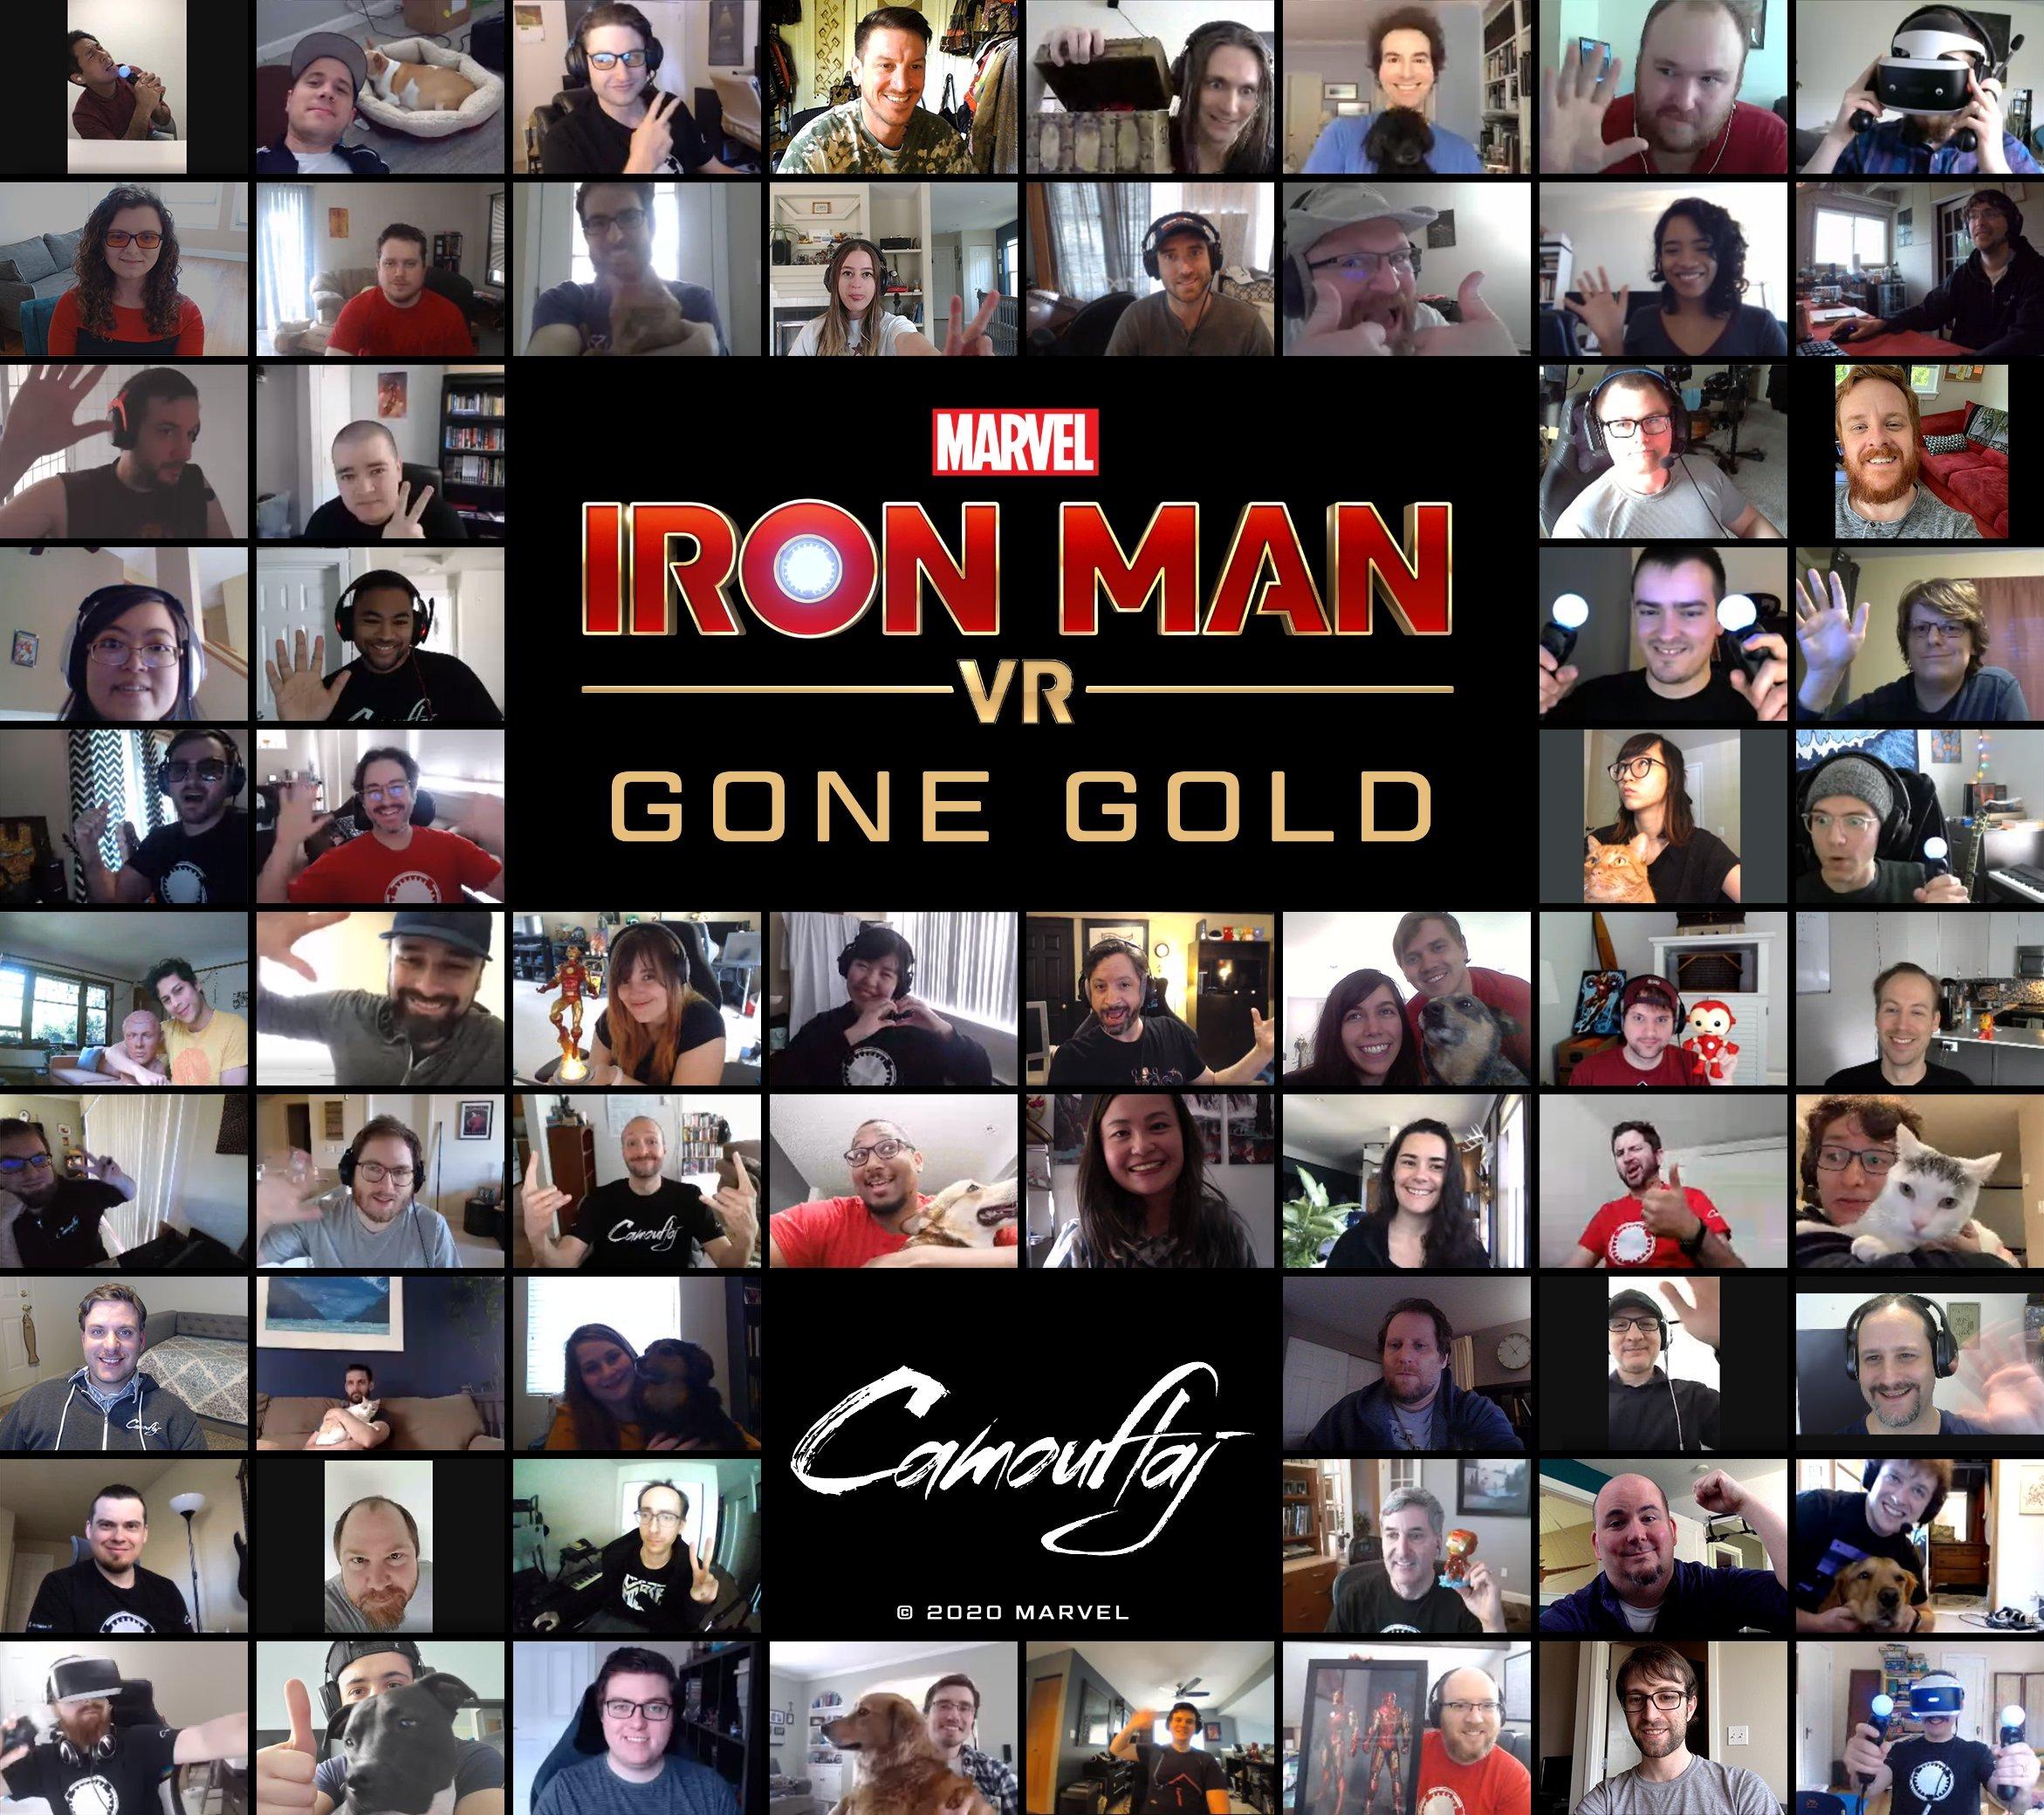 Marvel's Iron Man VR ушла на золото